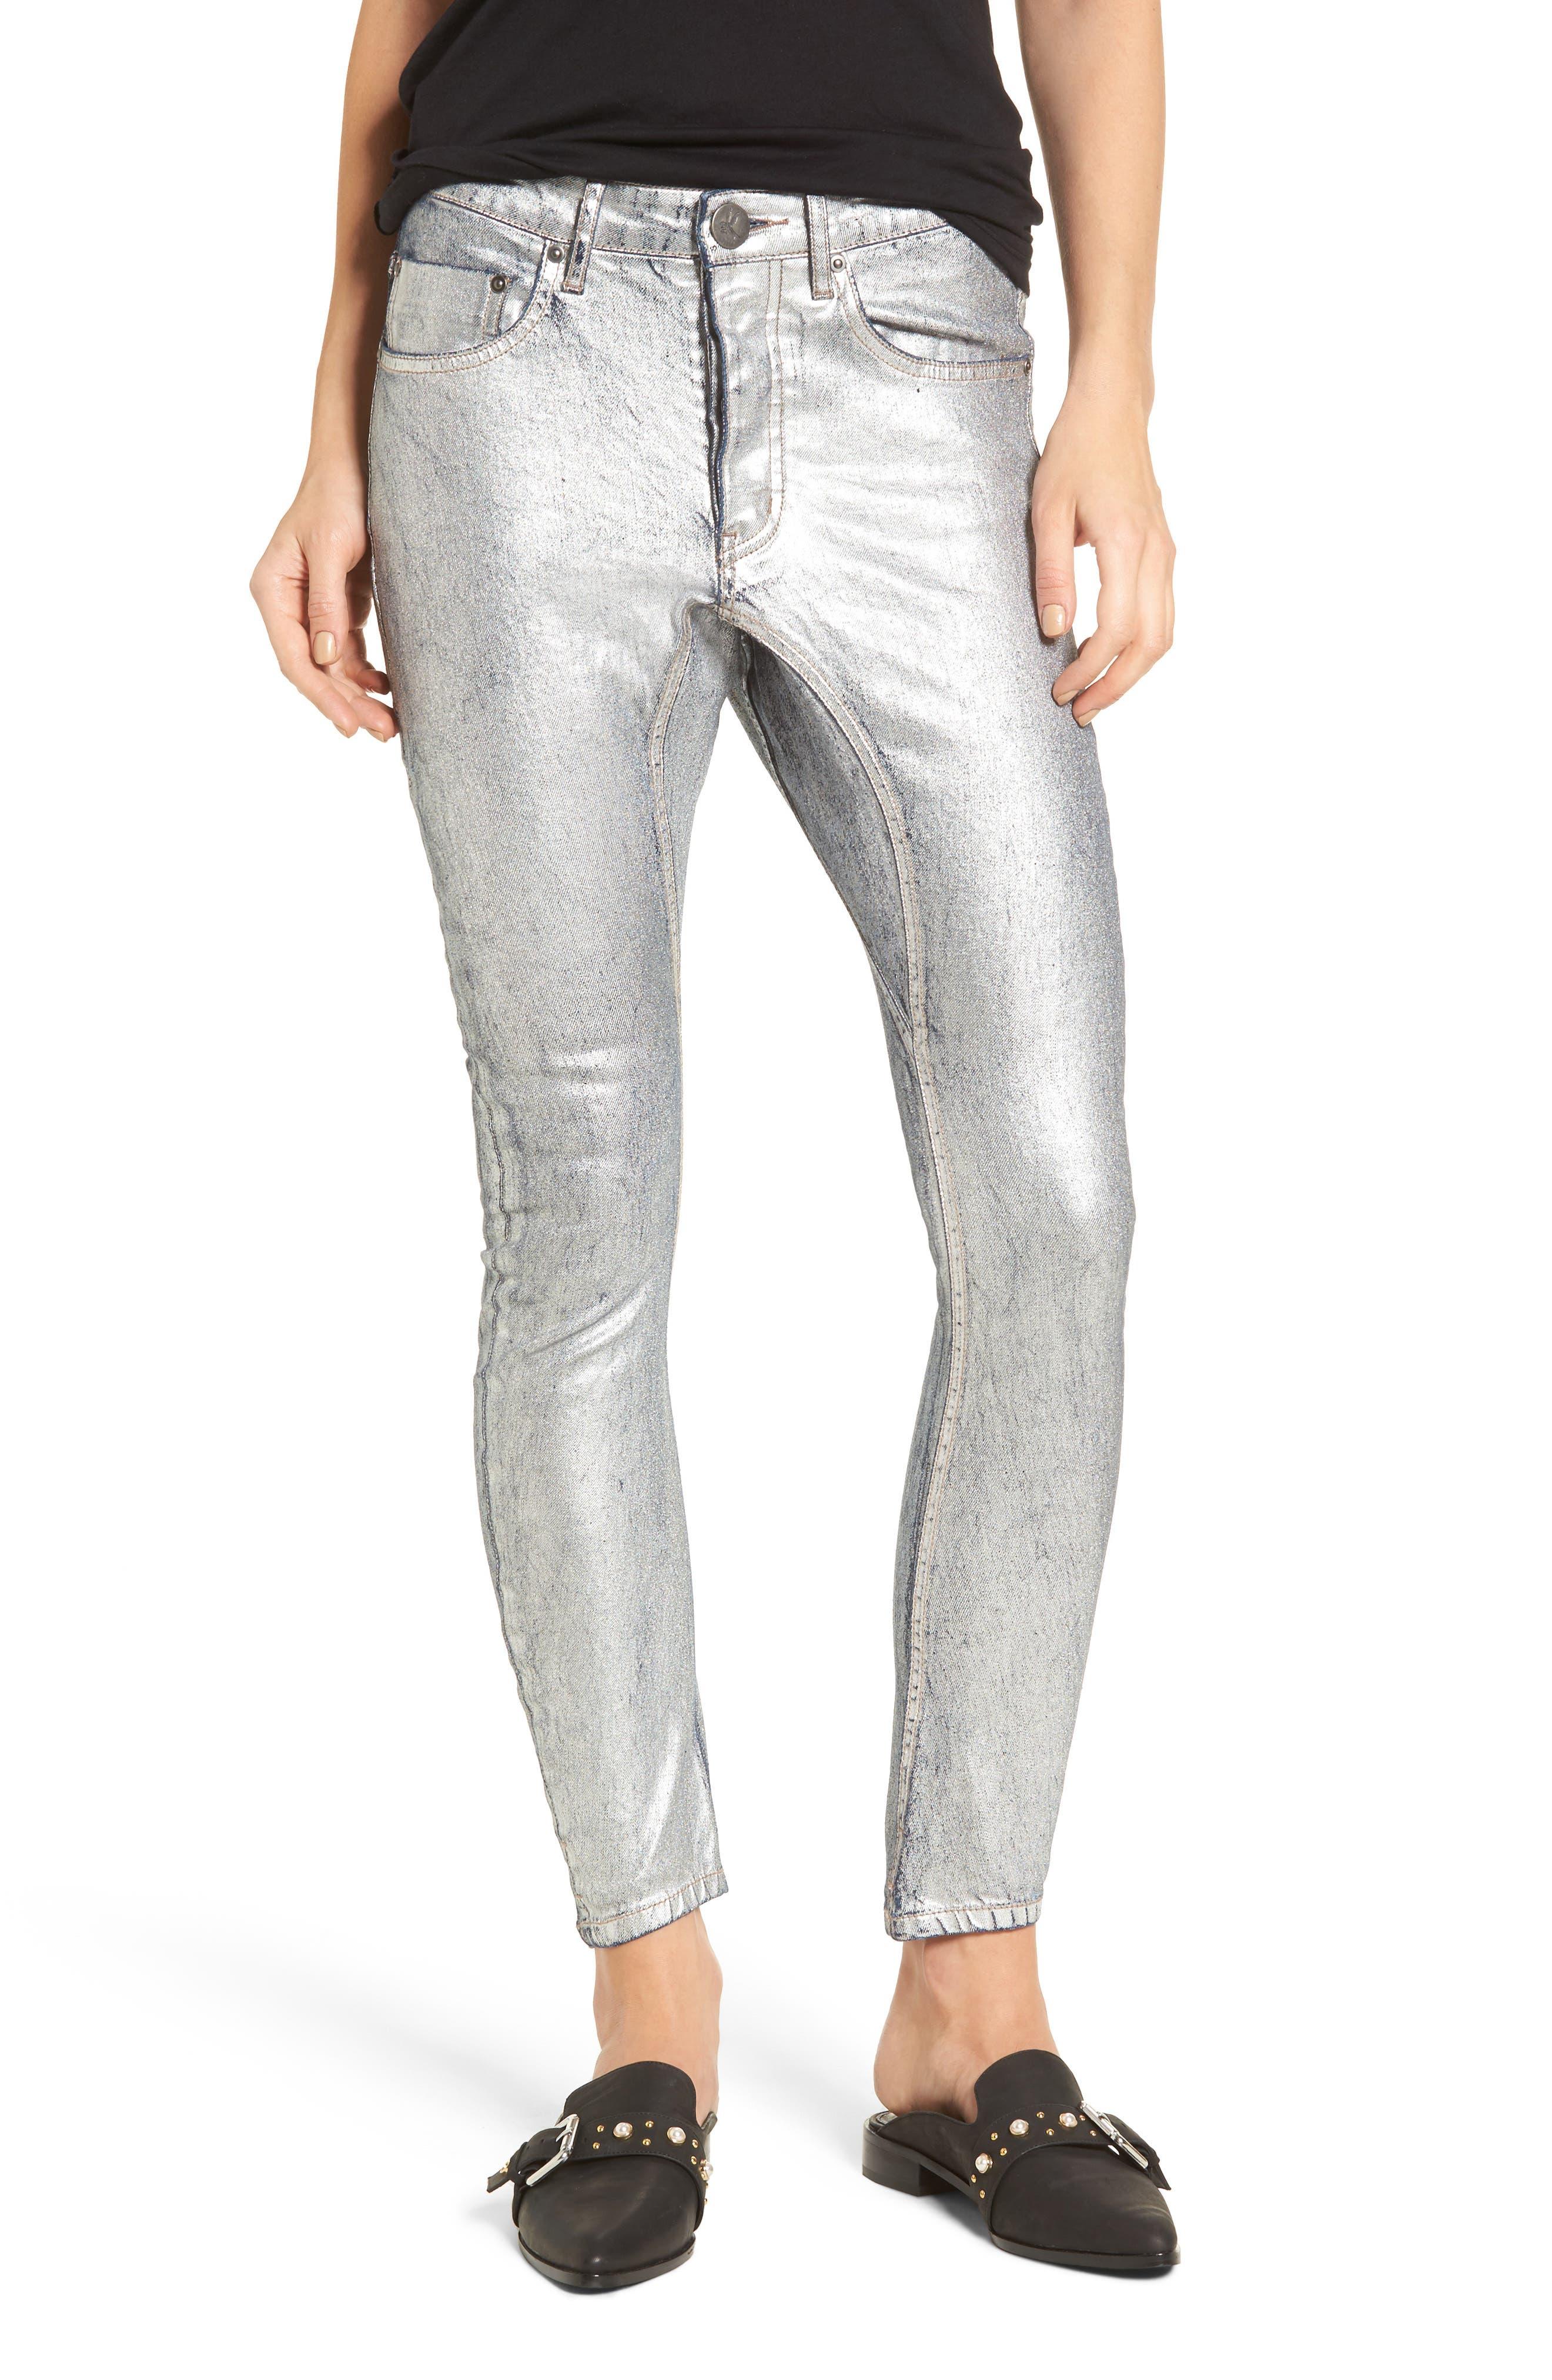 Kidds Metallic Drop Crotch Skinny Jeans,                             Main thumbnail 1, color,                             040